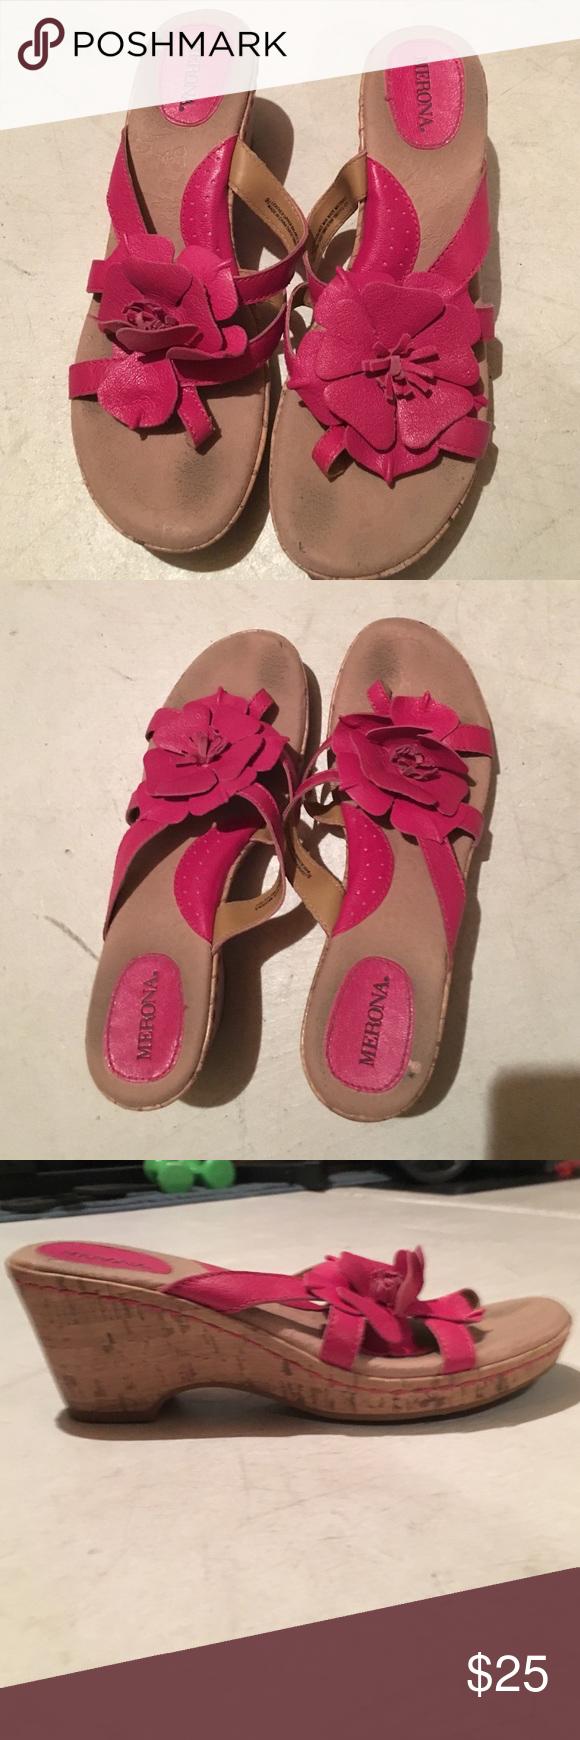 Merona wedges Pink Merona Wedges, slightly worn Merona Shoes Wedges